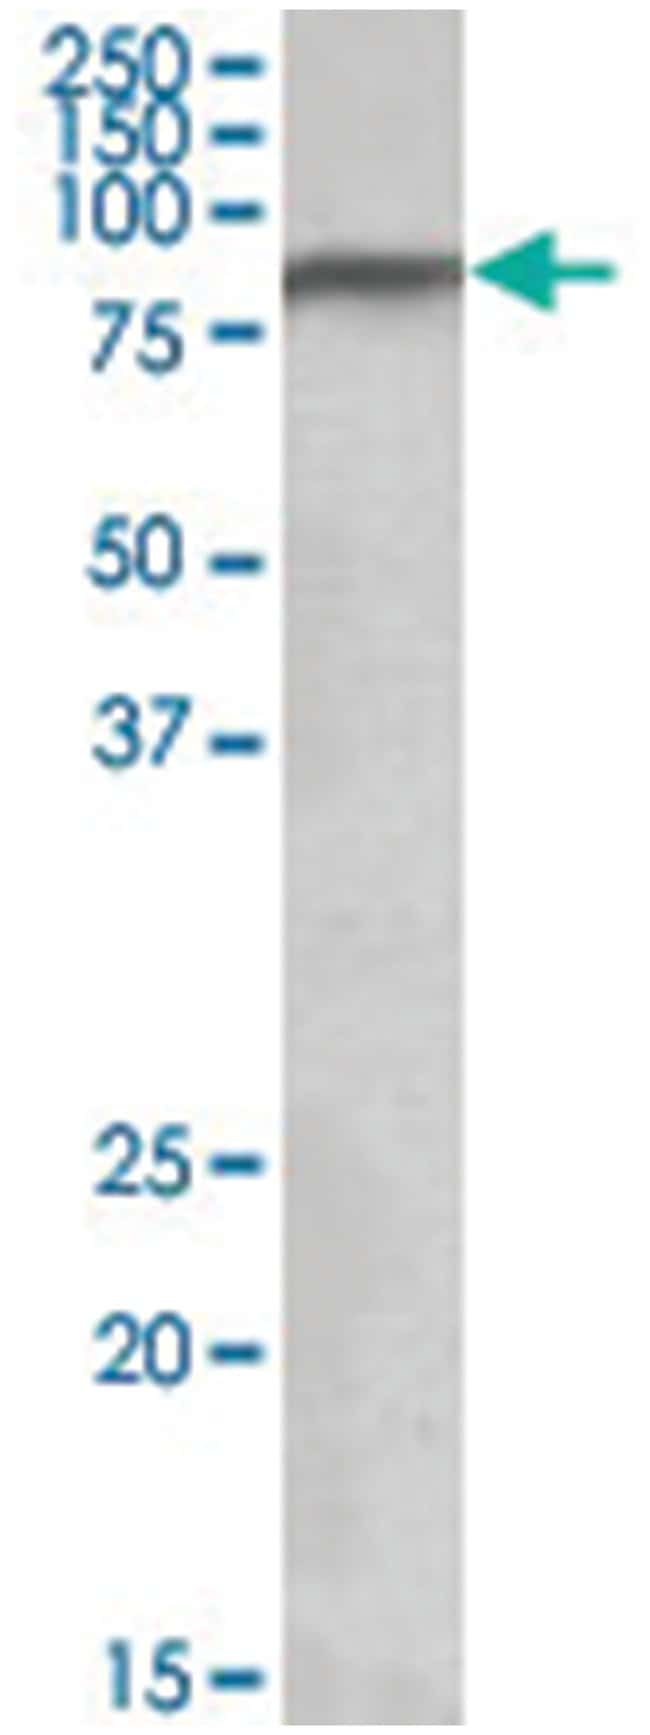 NDUFS1, Goat, Polyclonal Antibody, Abnova 100µg; Unlabeled:Life Sciences